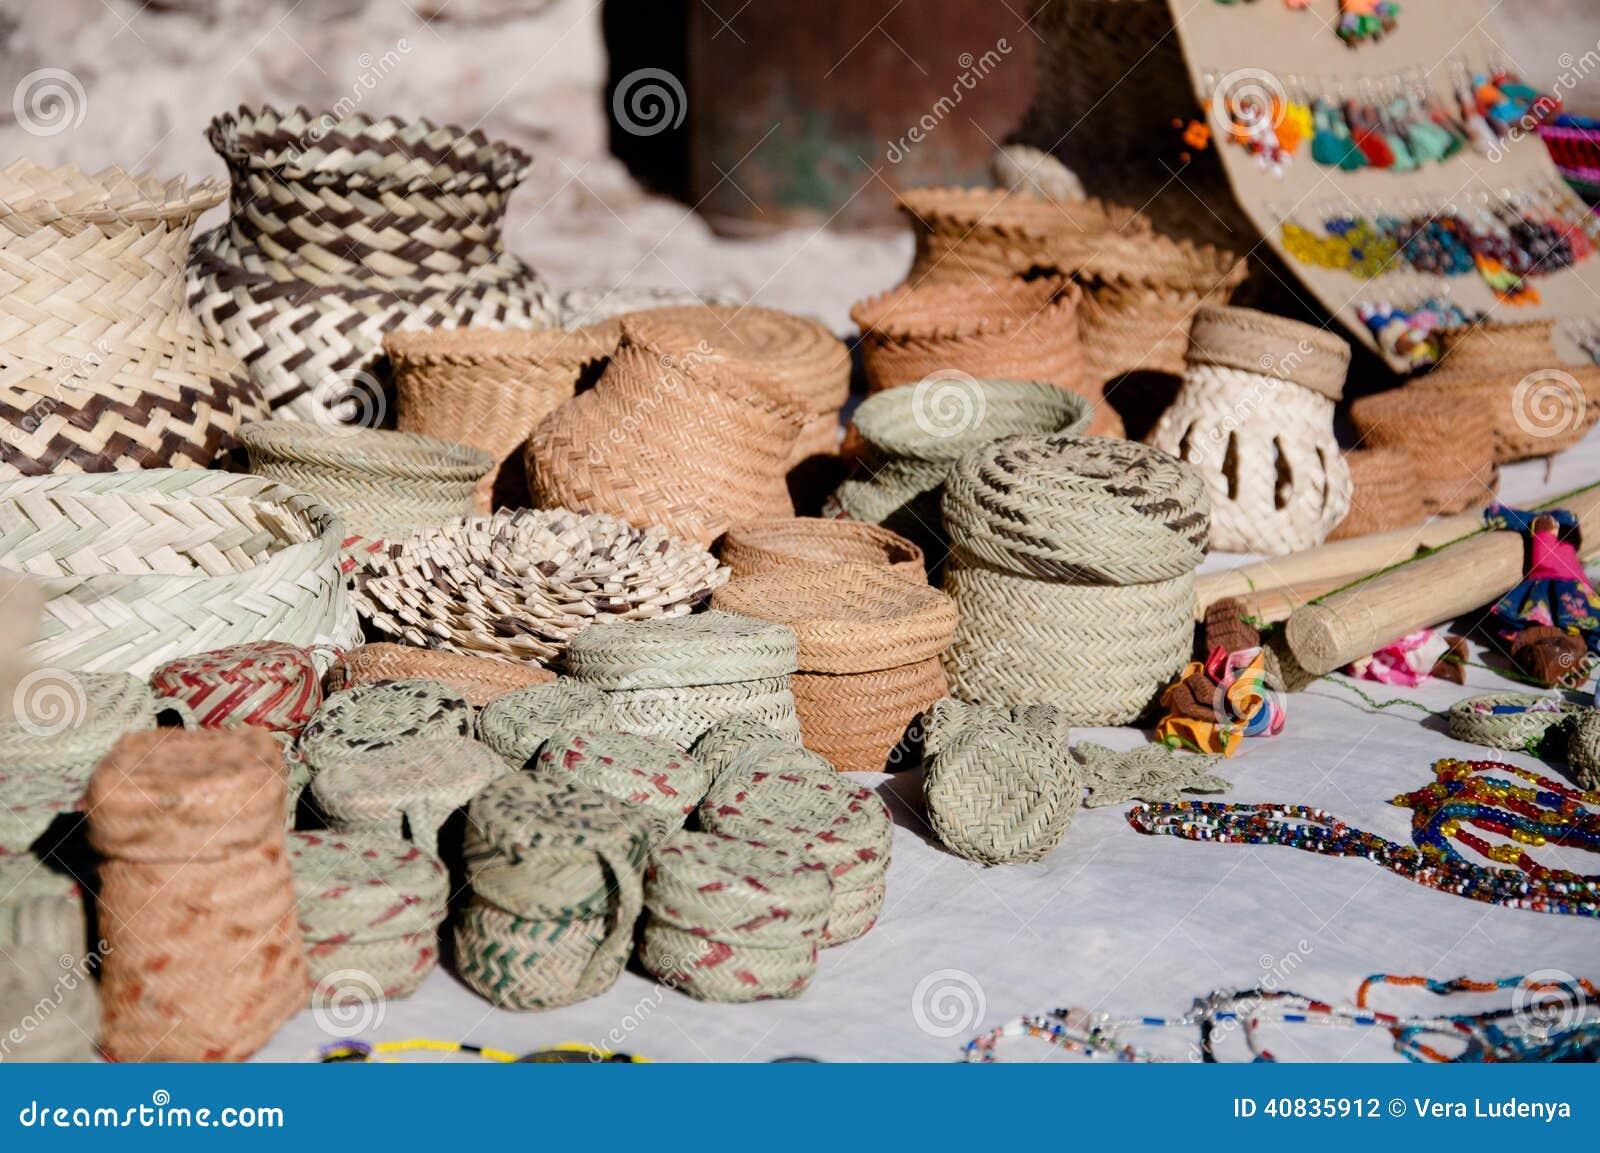 Basket Of Apples Clipart Tarahumara's handicraf...